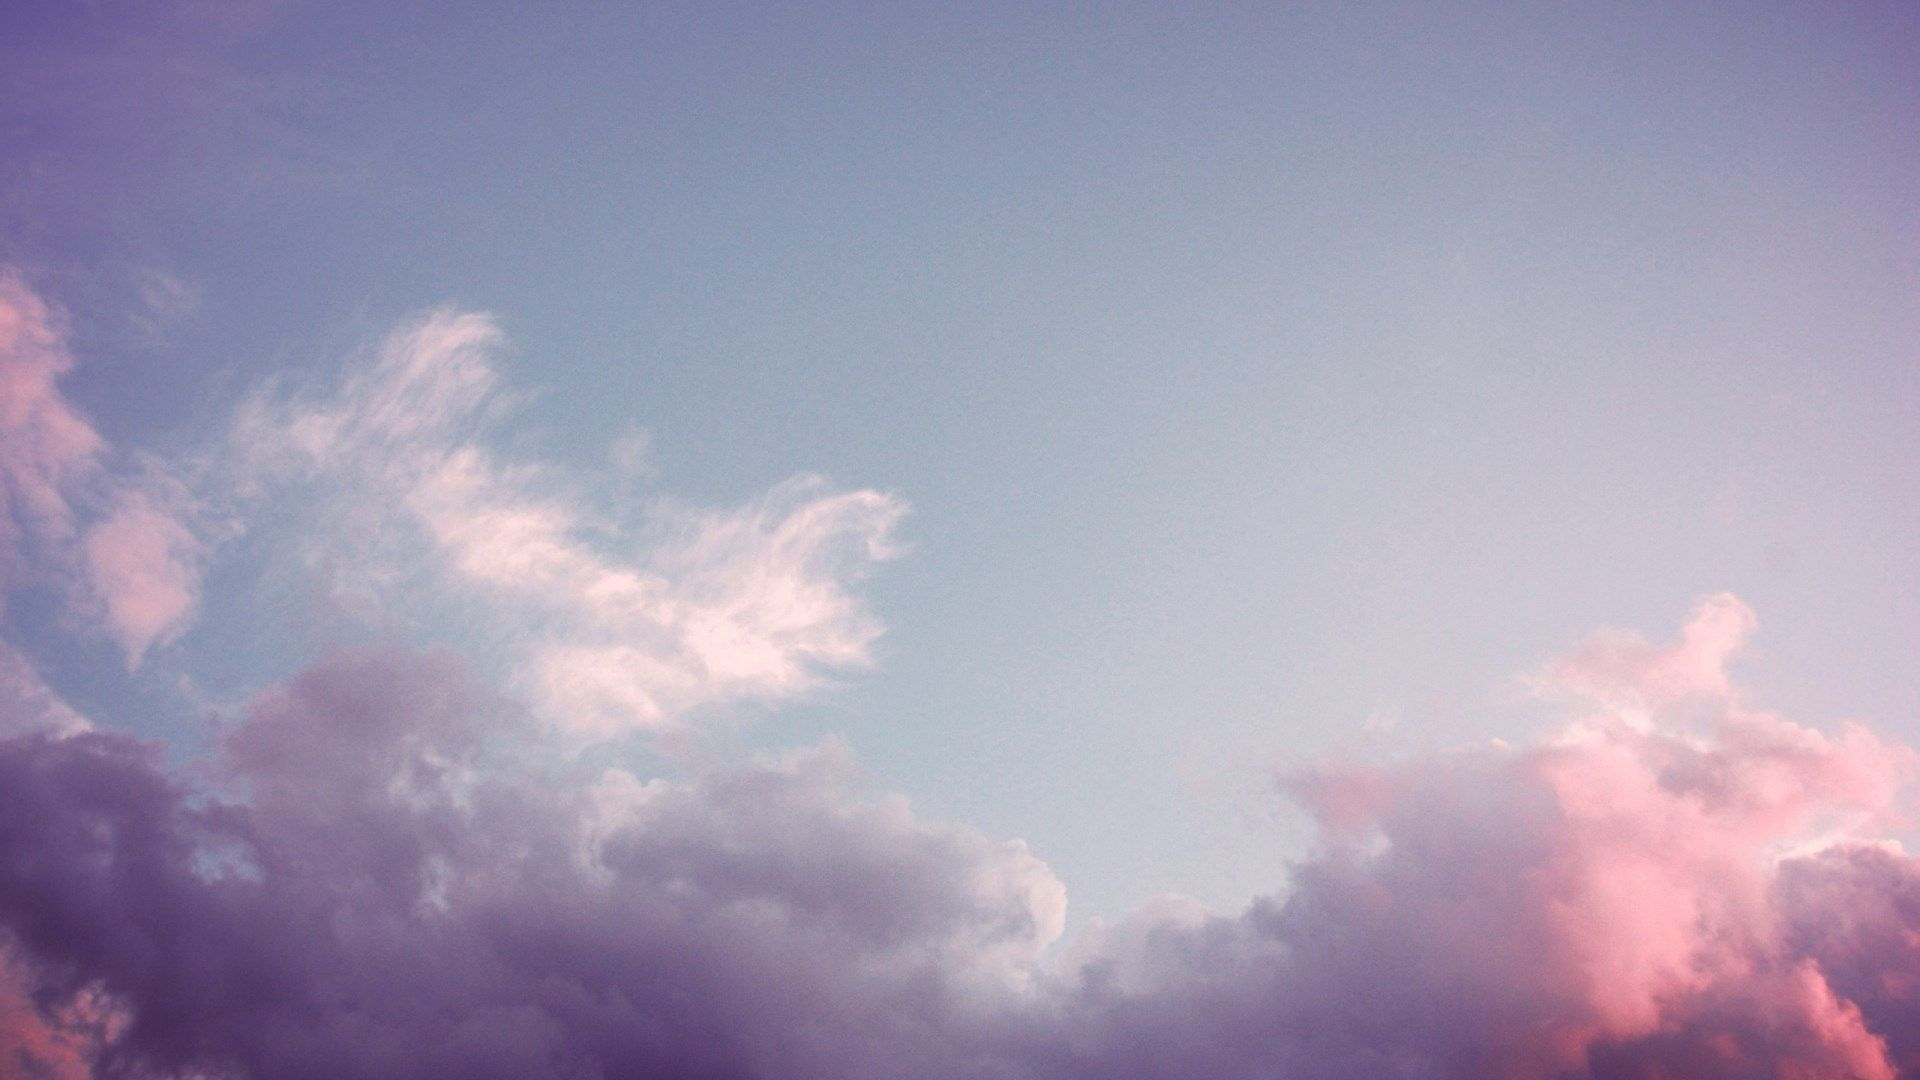 Sky High Resolution Wallpapers Widescreen Laptop Wallpaper Pink Clouds Wallpaper Aesthetic Desktop Wallpaper Aesthetic clouds wallpaper laptop hd